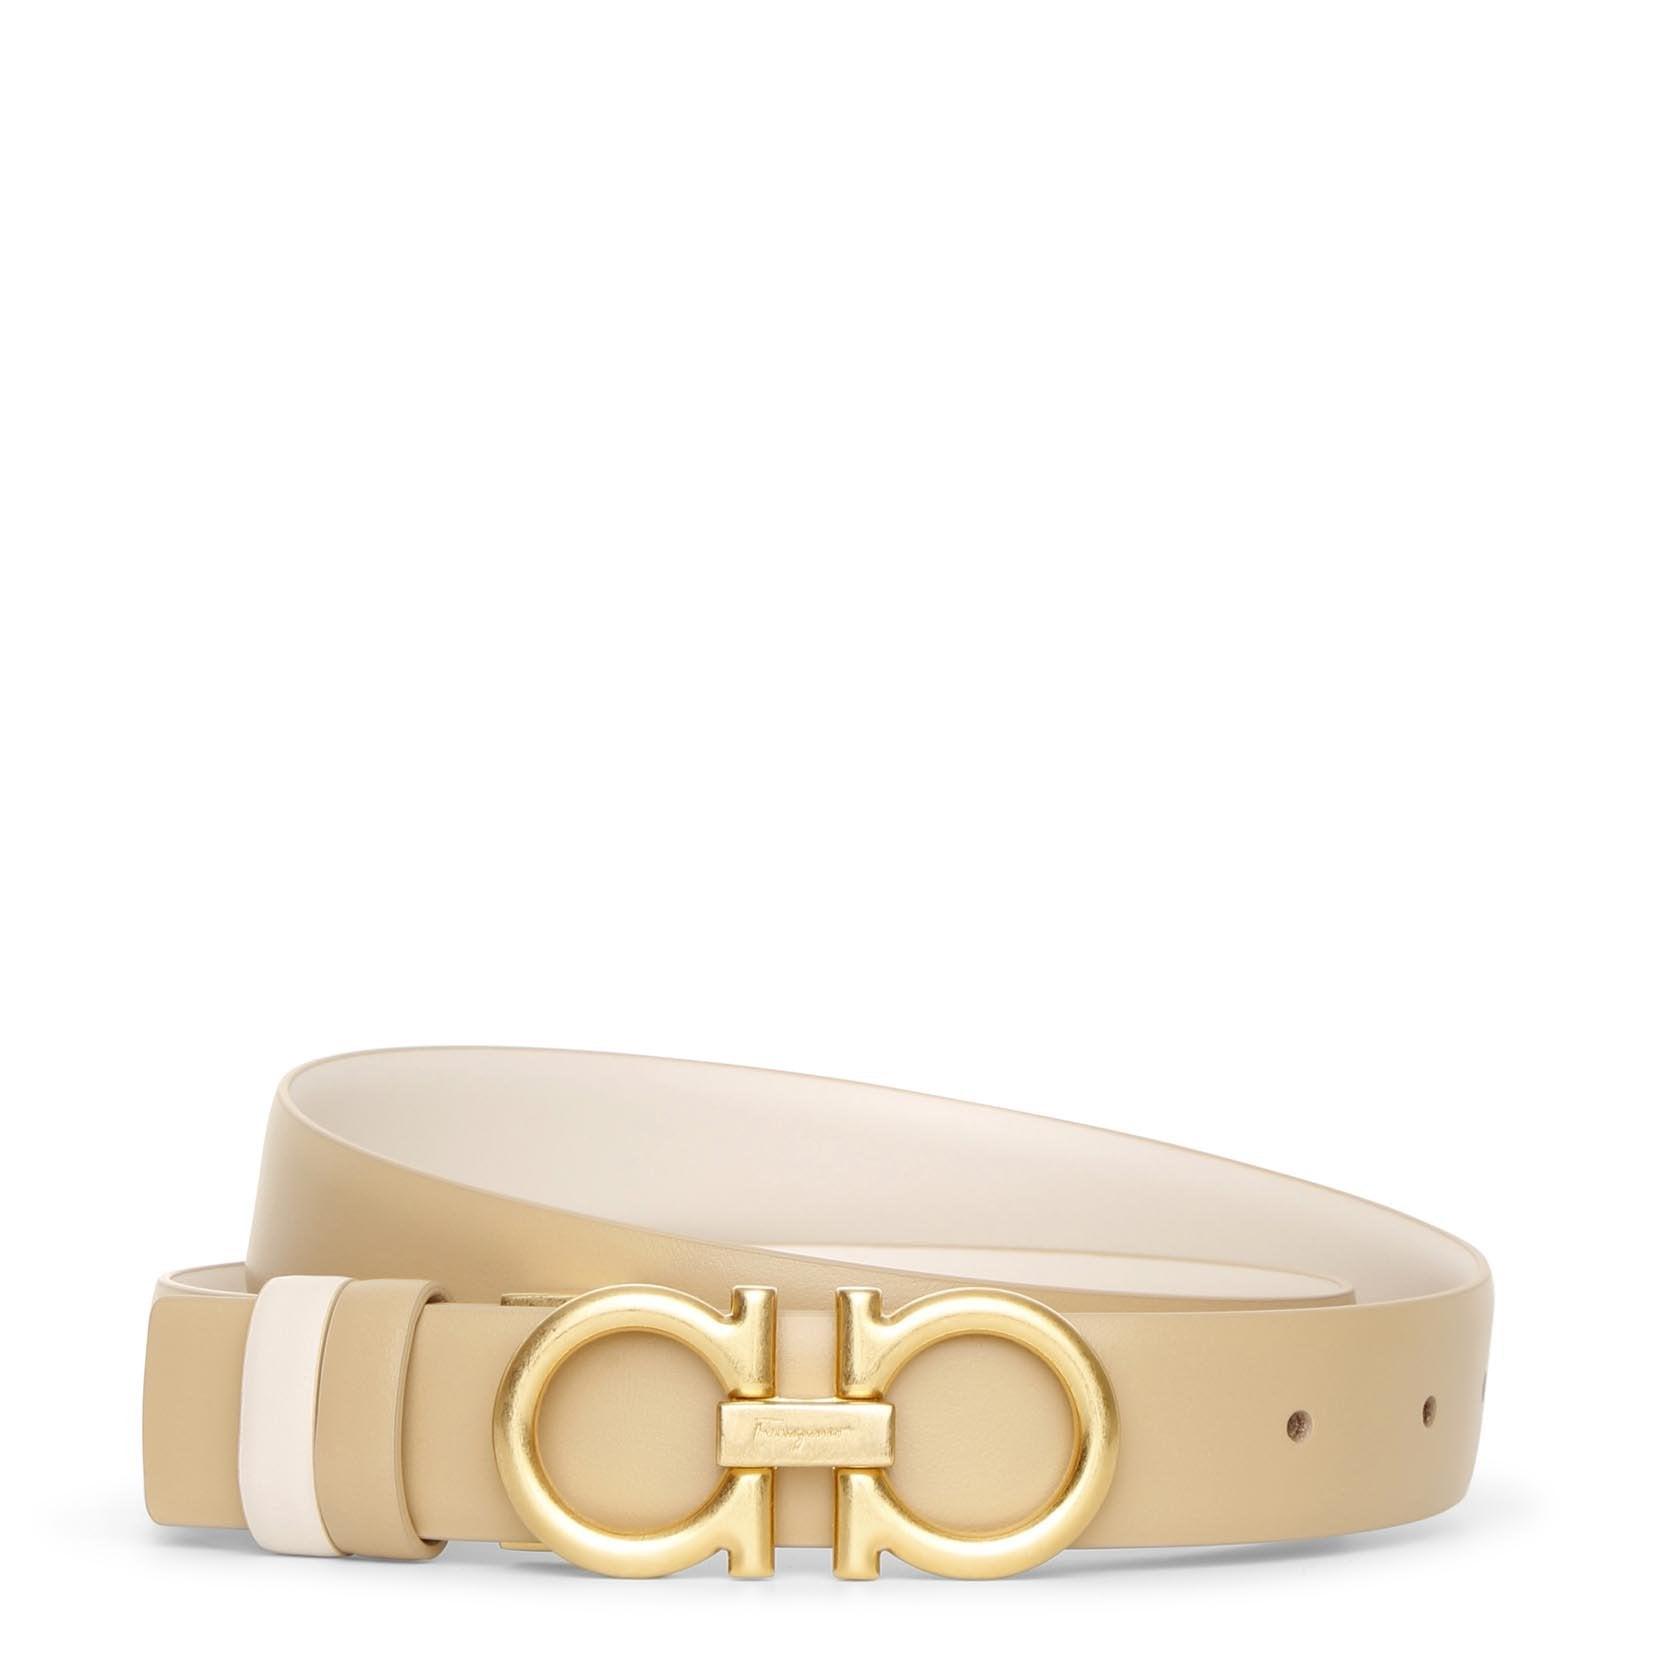 Salvatore Ferragamo Reversable and adjustable beige cream leather belt  - beige/white - female - Size: 90